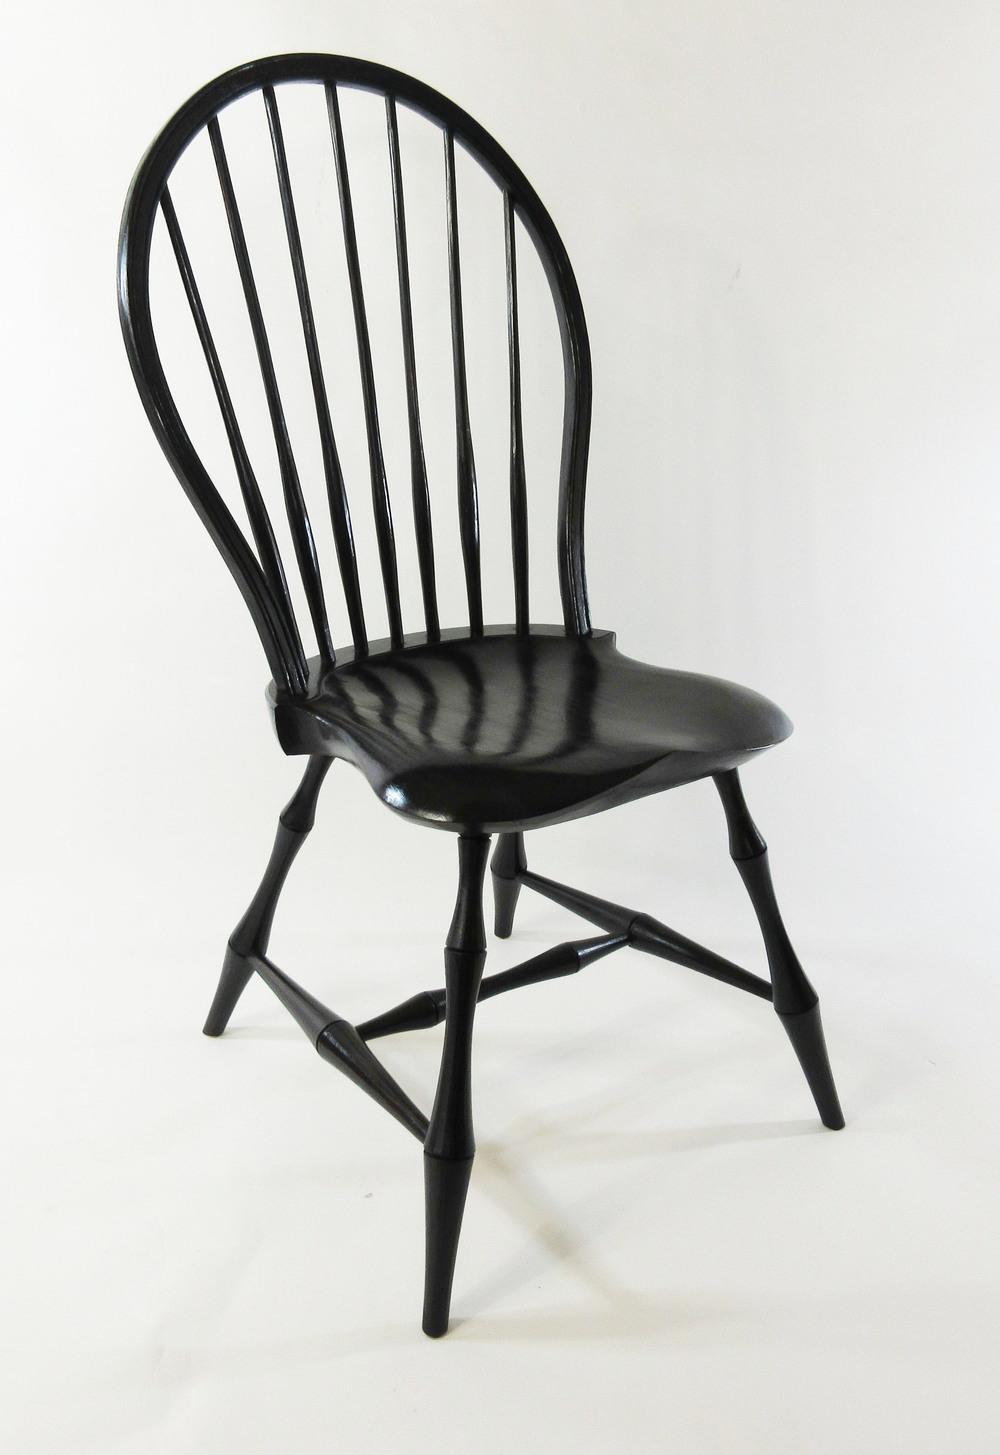 Make a Balloon Back Side Chair with Luke A. Barnett - Woodworking Class